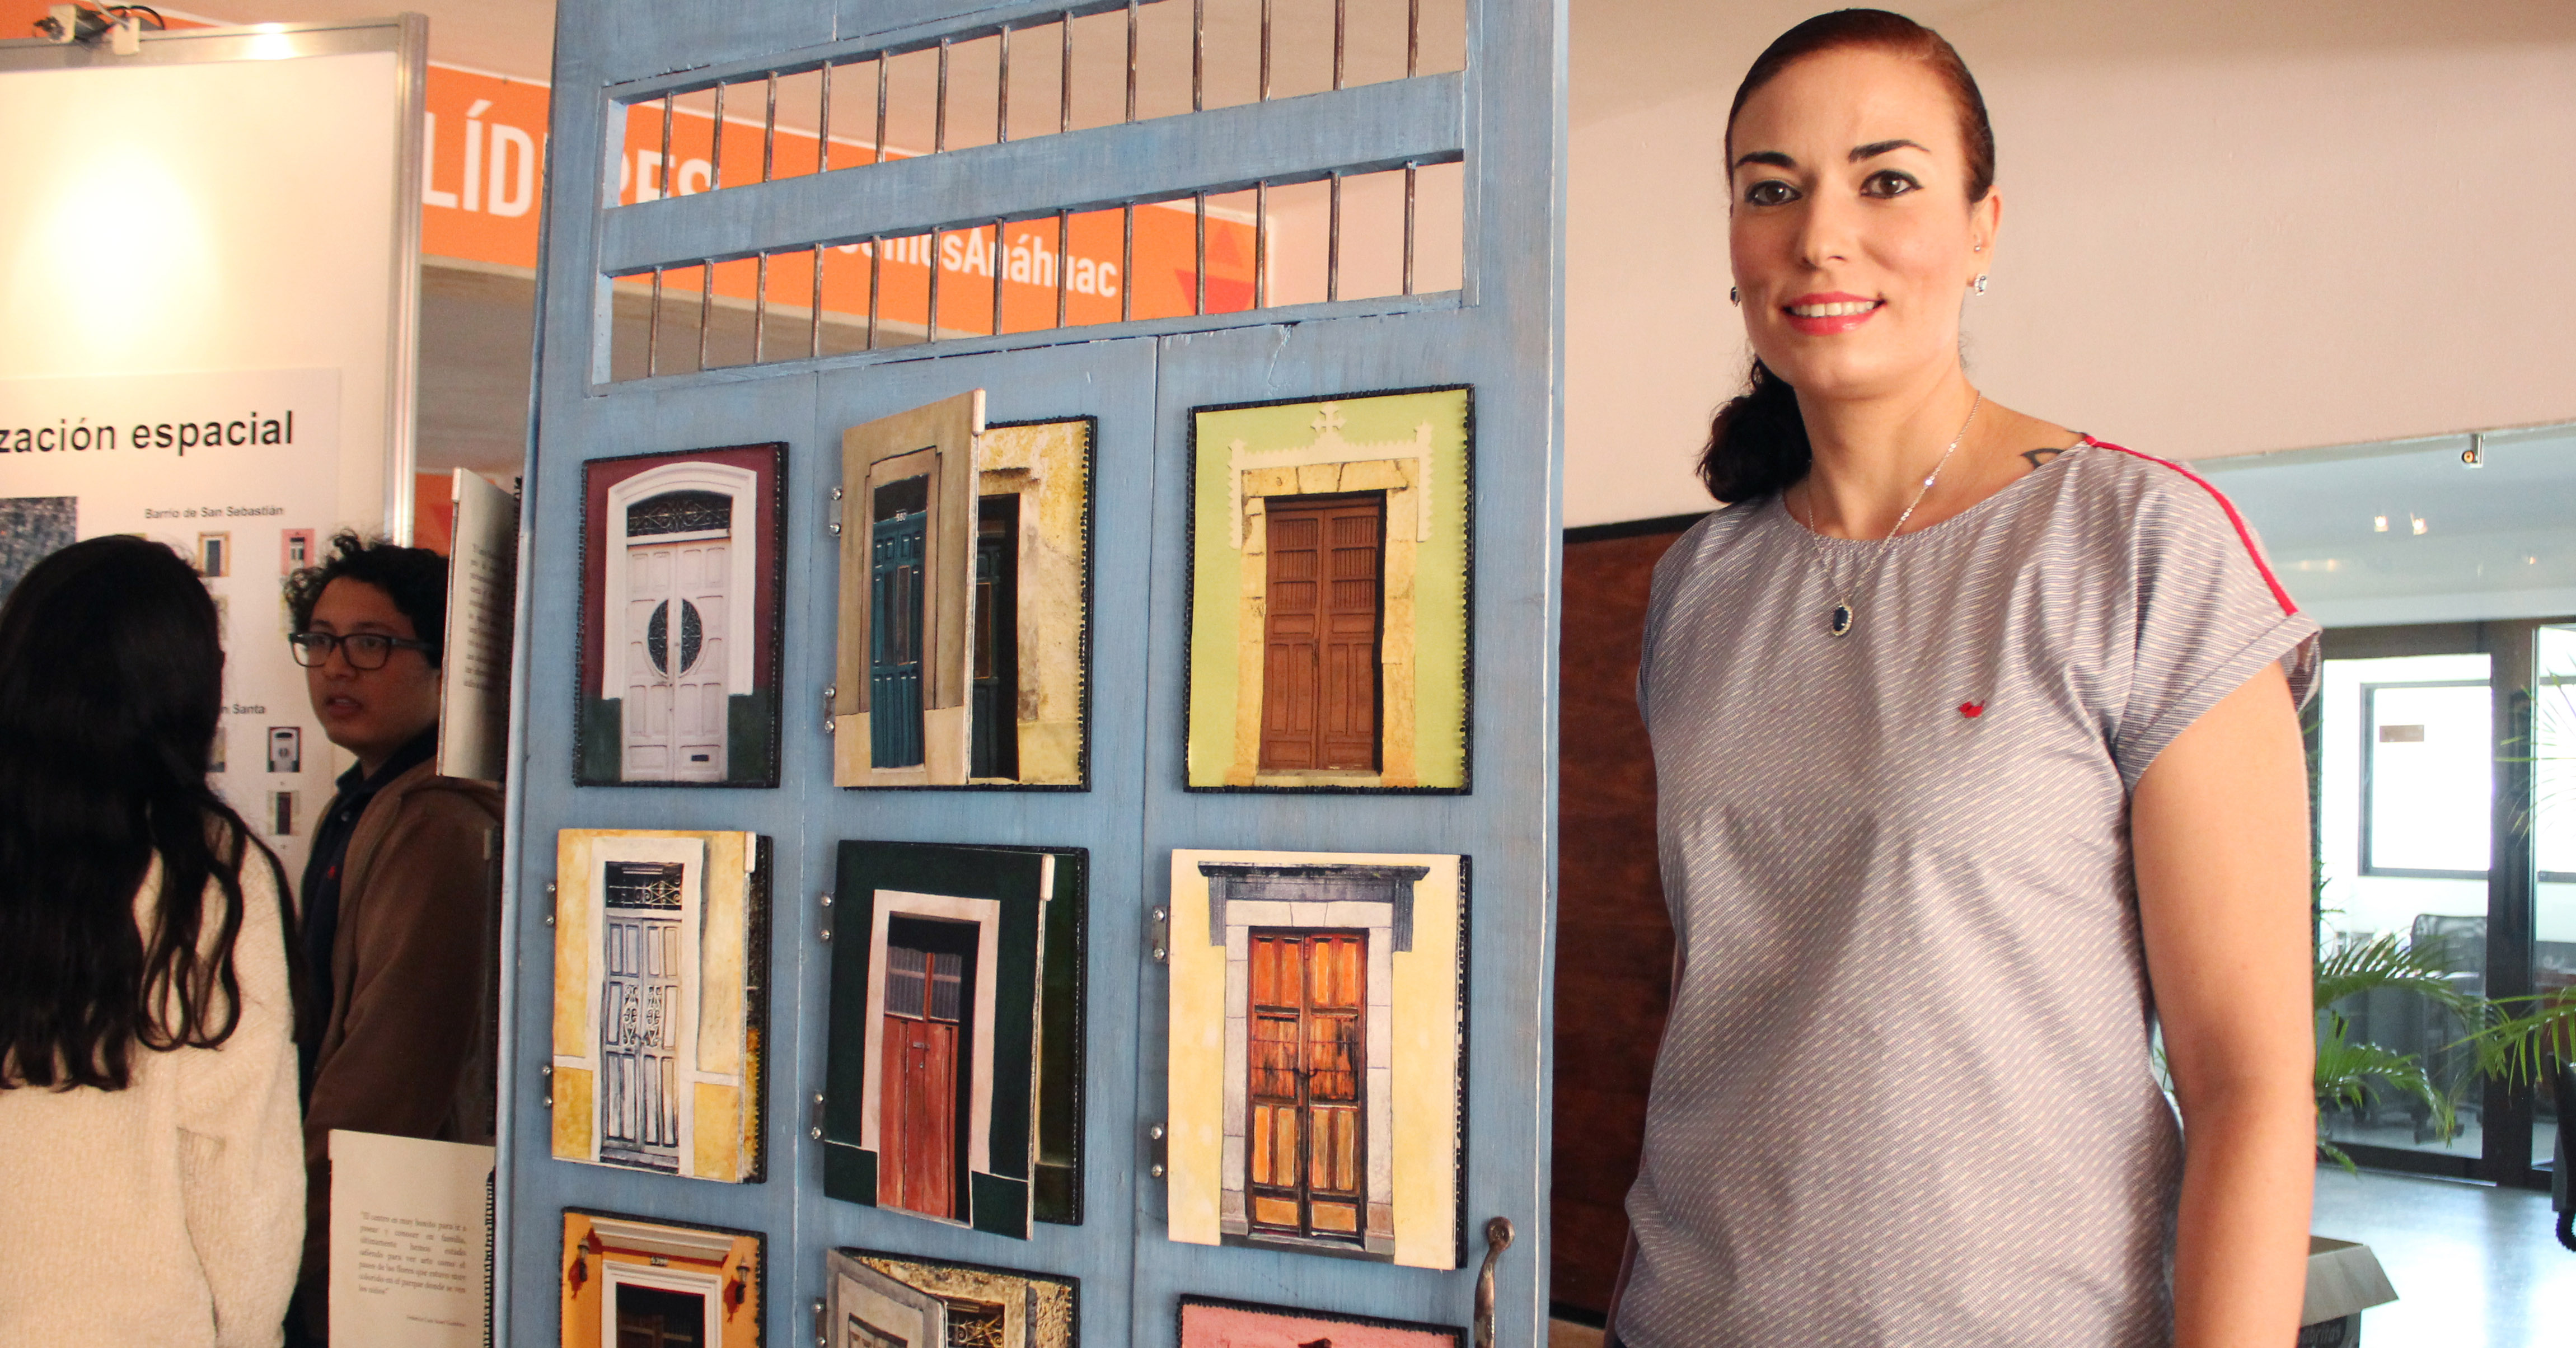 Exposición Revalorización del Patrimonio - Difusión Cultural